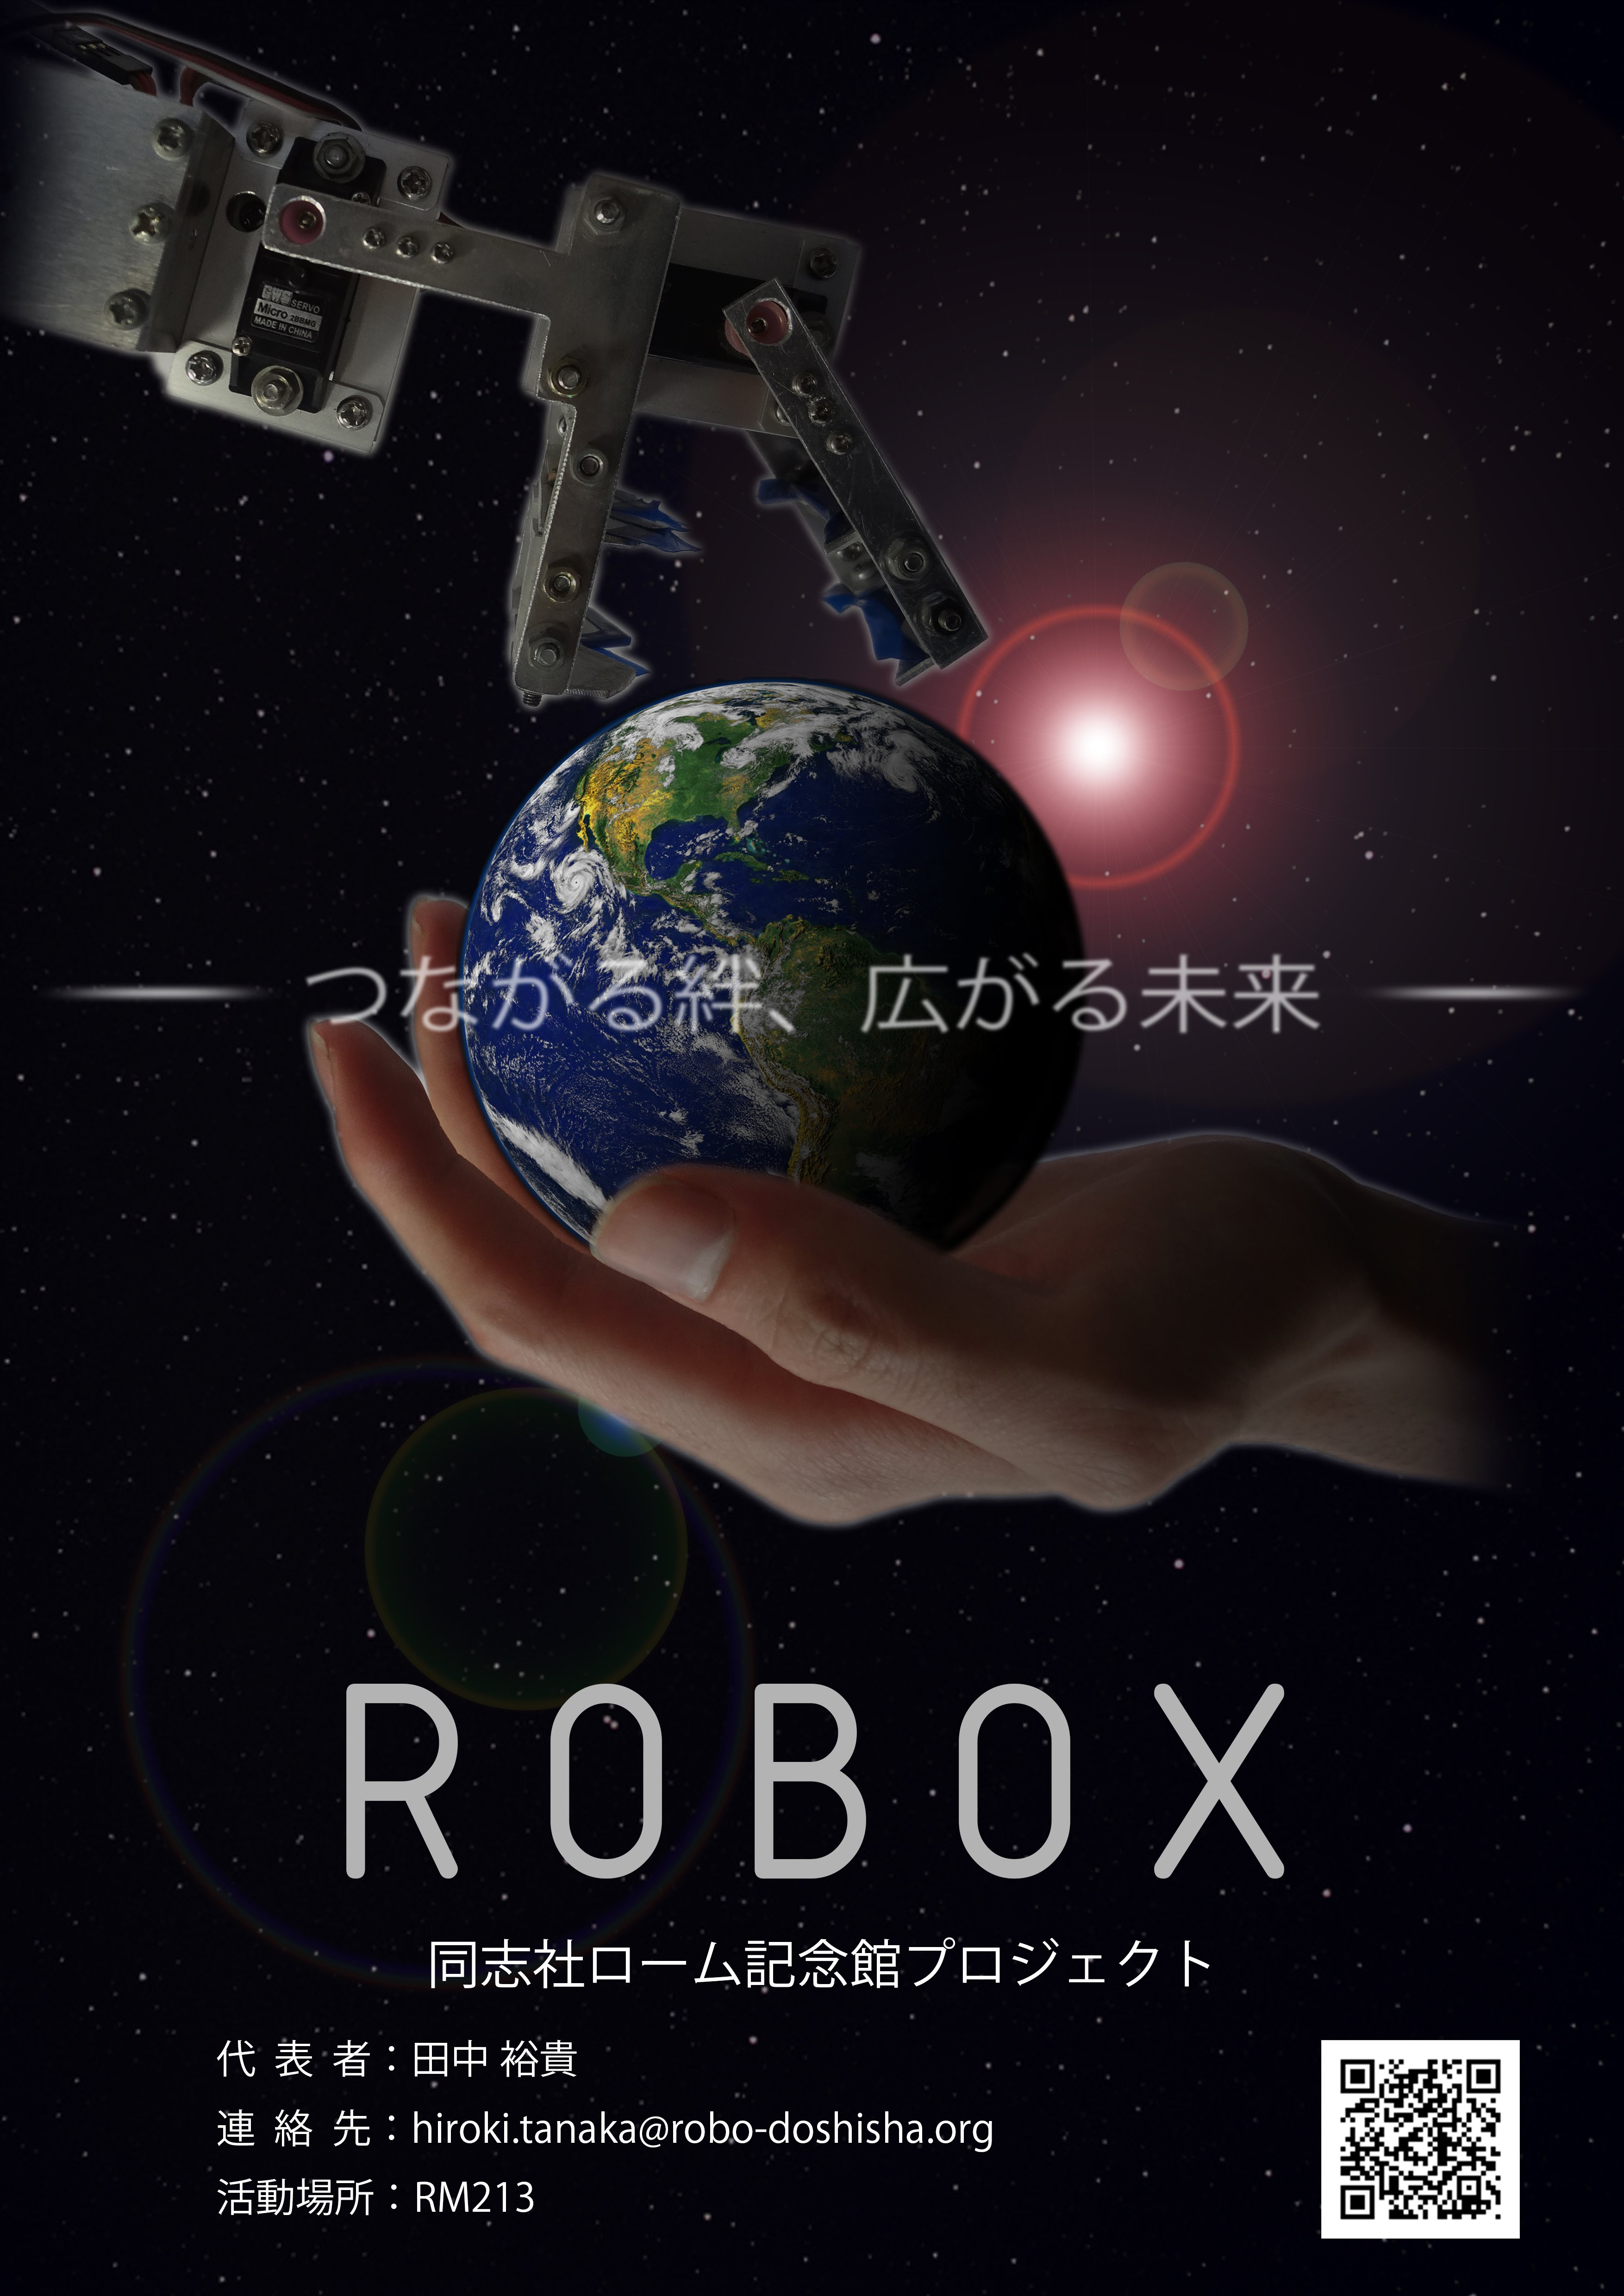 ROBOX 画像